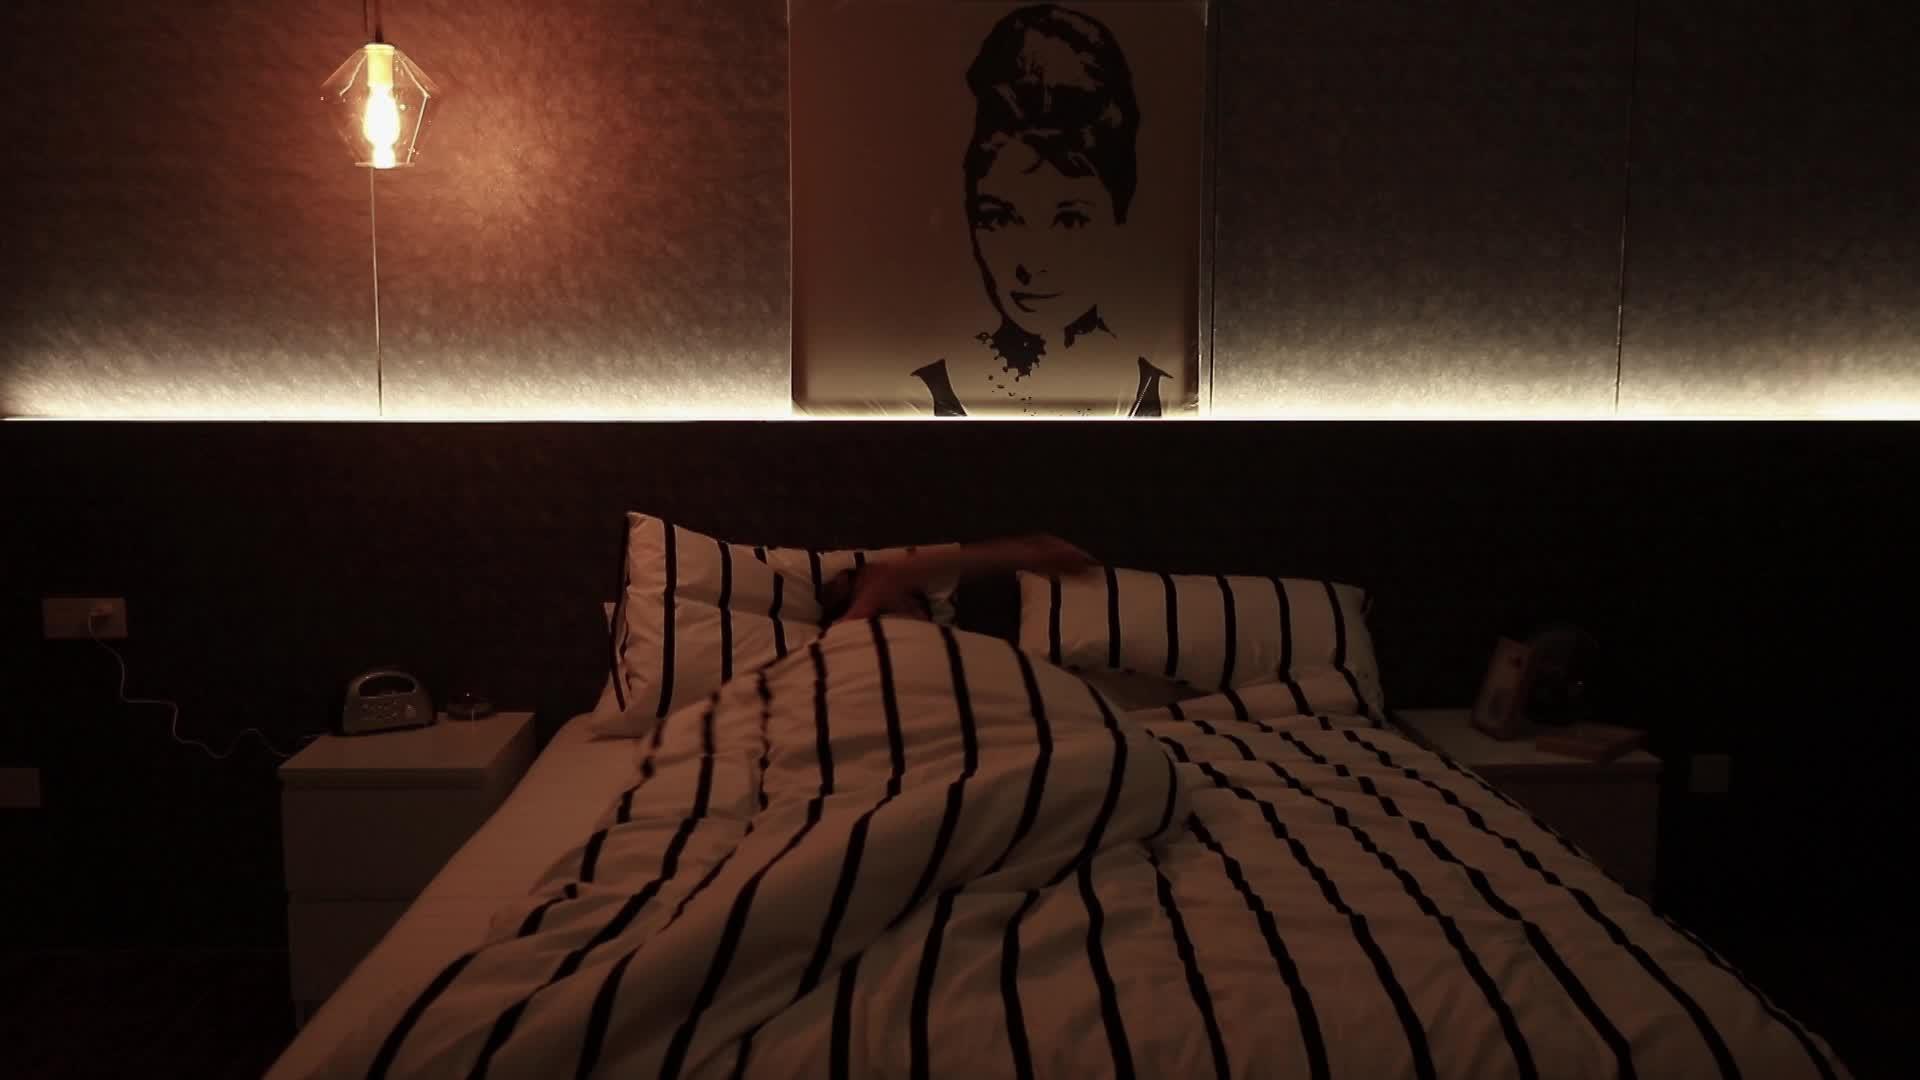 Sound Therapy Sleep Mate เครื่องเสียงสีขาว Soothing พื้นหลัง